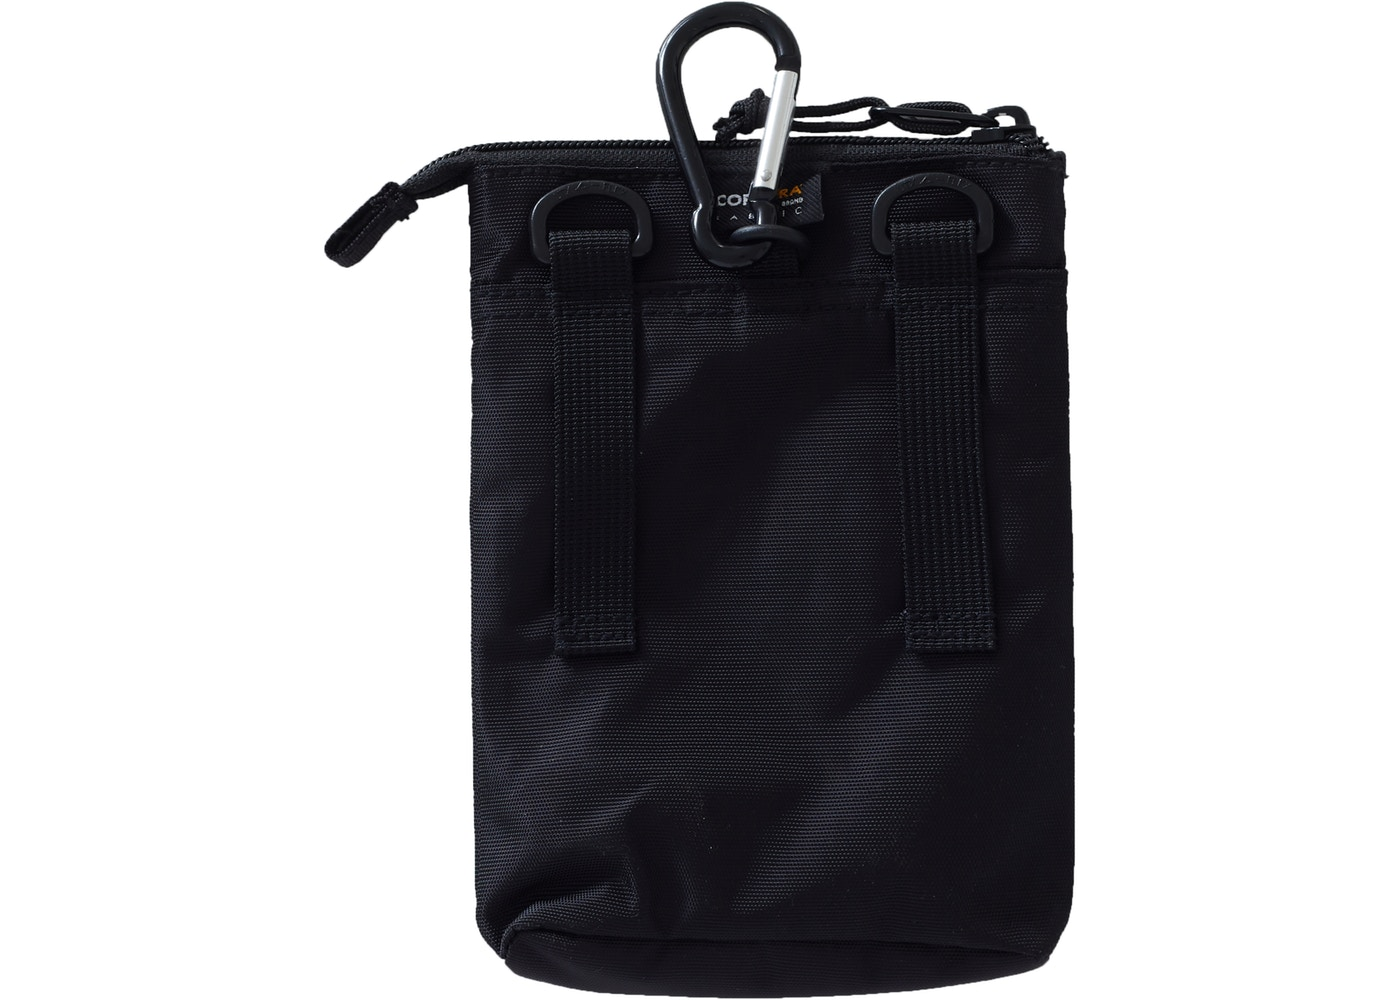 5dd182294063b Supreme Bags - Buy & Sell Streetwear